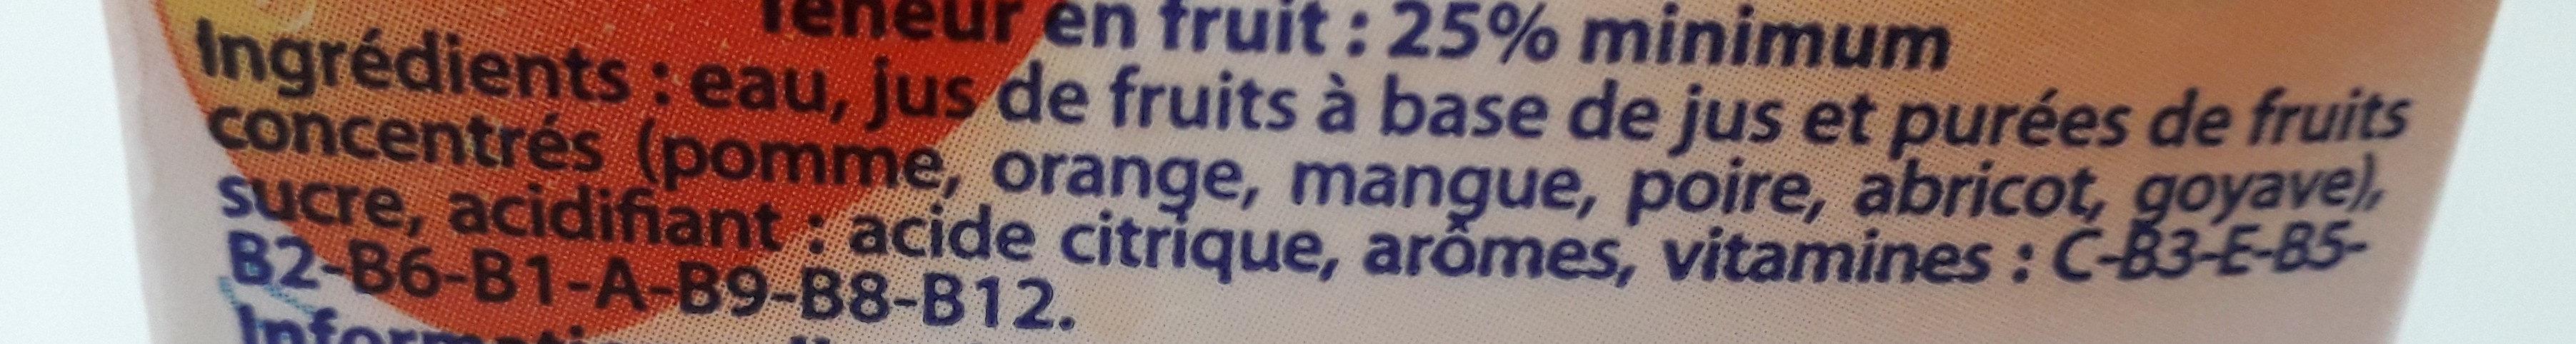 boisson tropicale - Ingrediënten